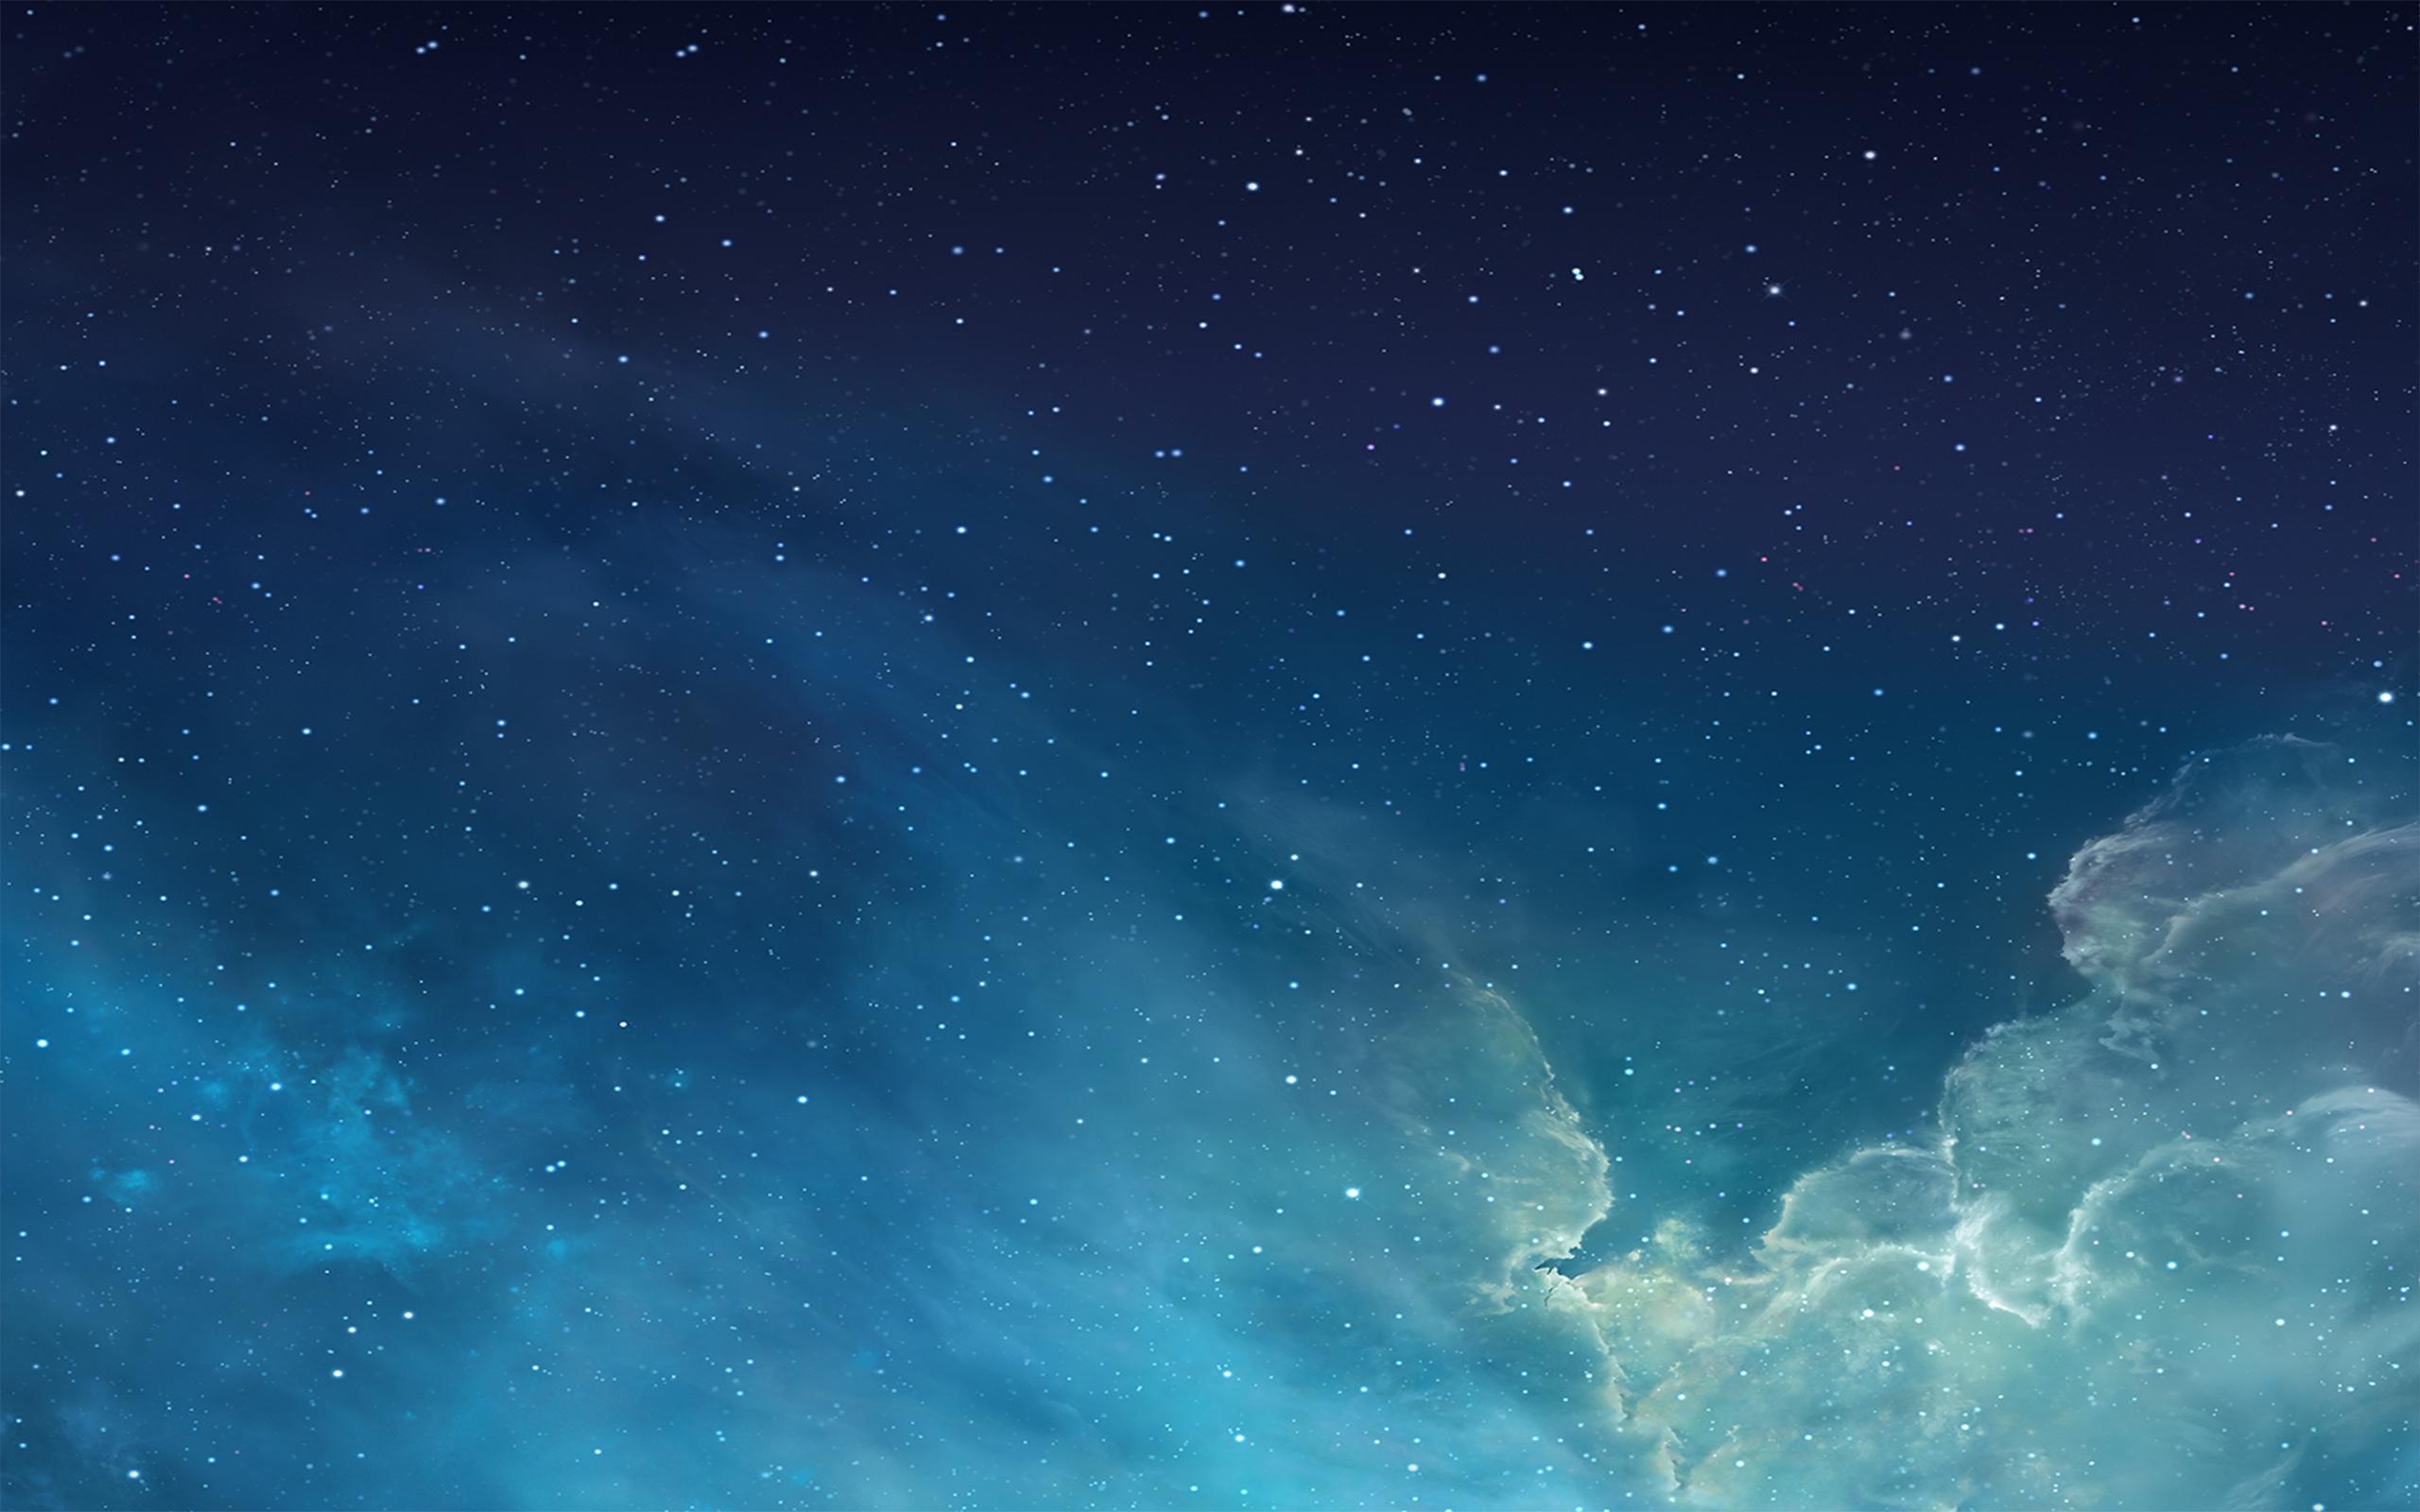 ios 7 galaxy image